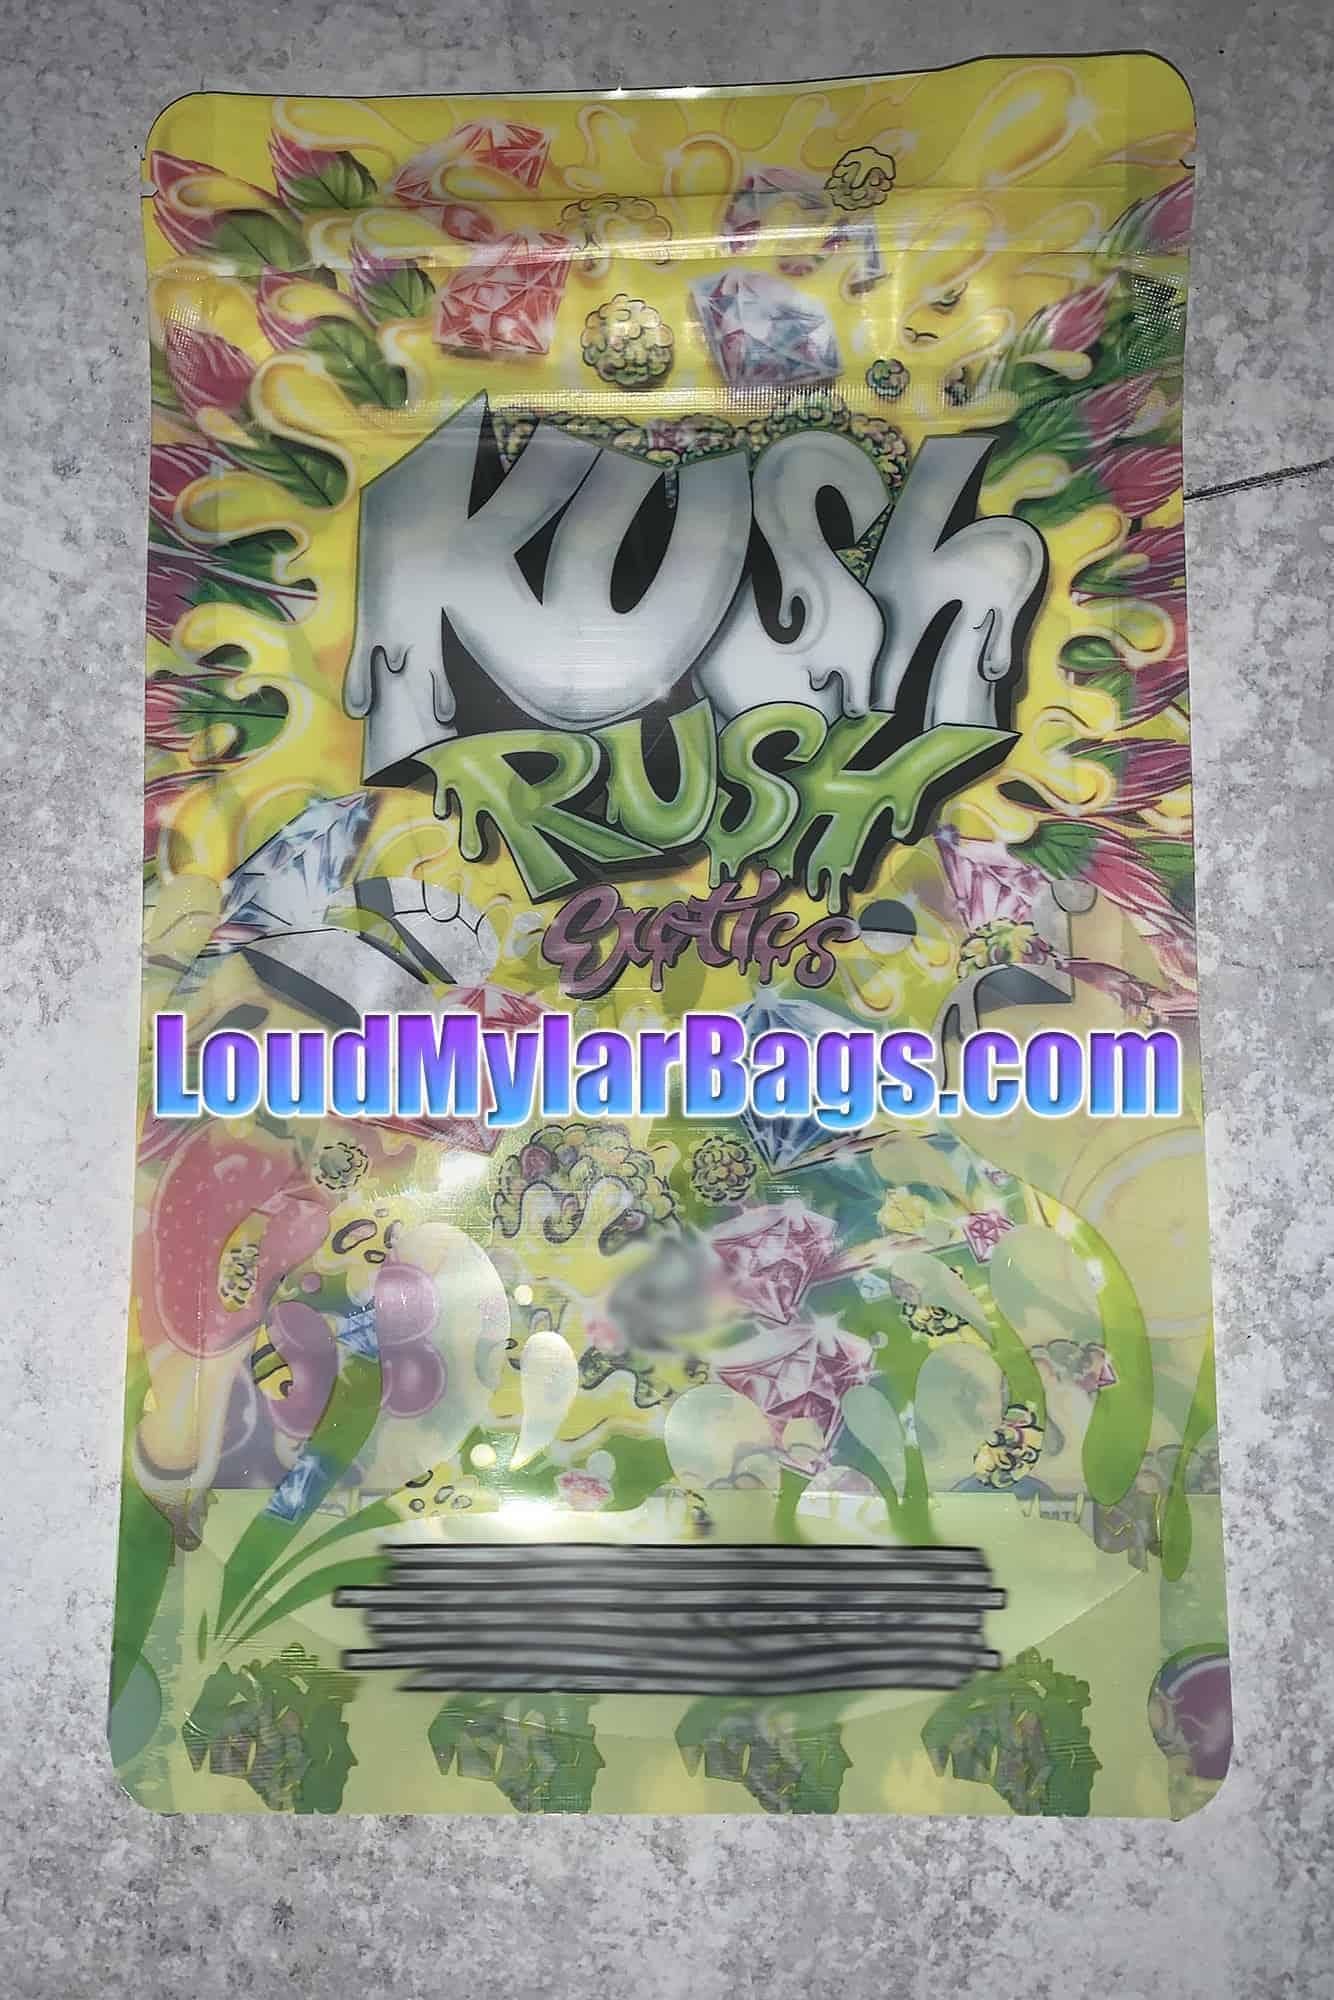 Kush Rush arzător de grăsime)